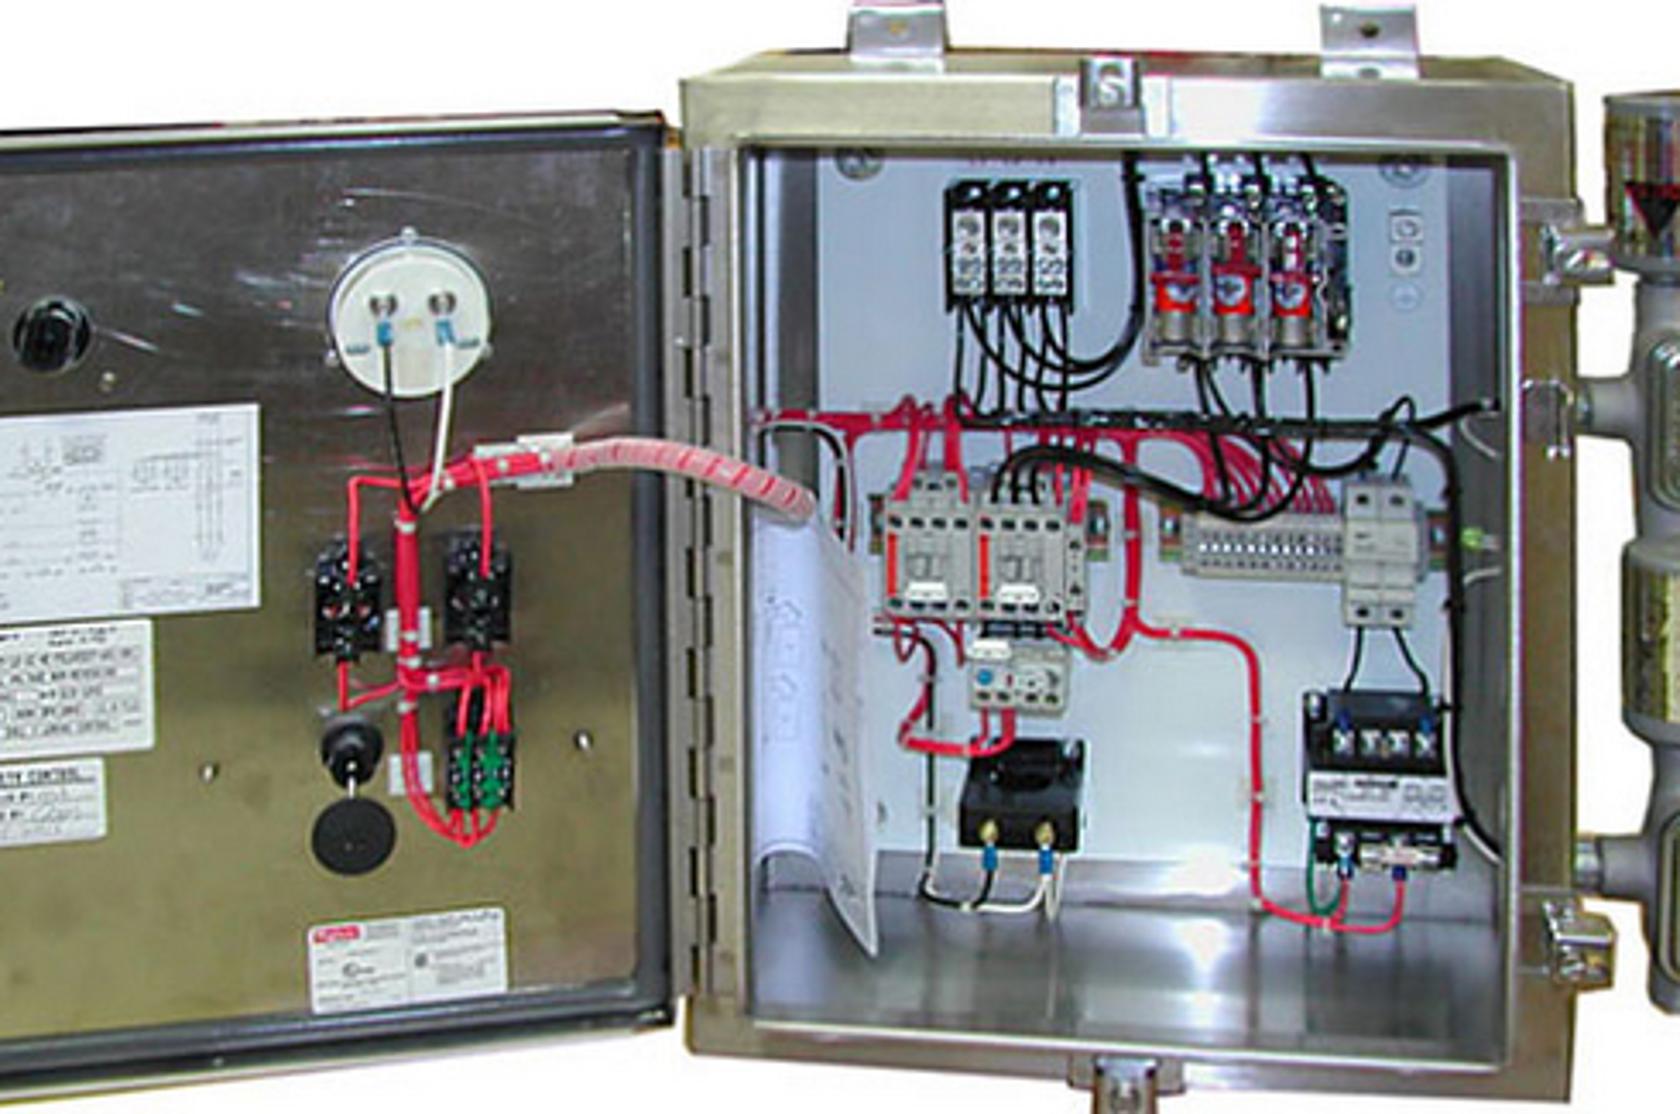 [CSDW_4250]   Industrial Wiring & Motor Controls - KCCTE | Industrial Machine Wiring |  | KCCTE - Pittsburg State University